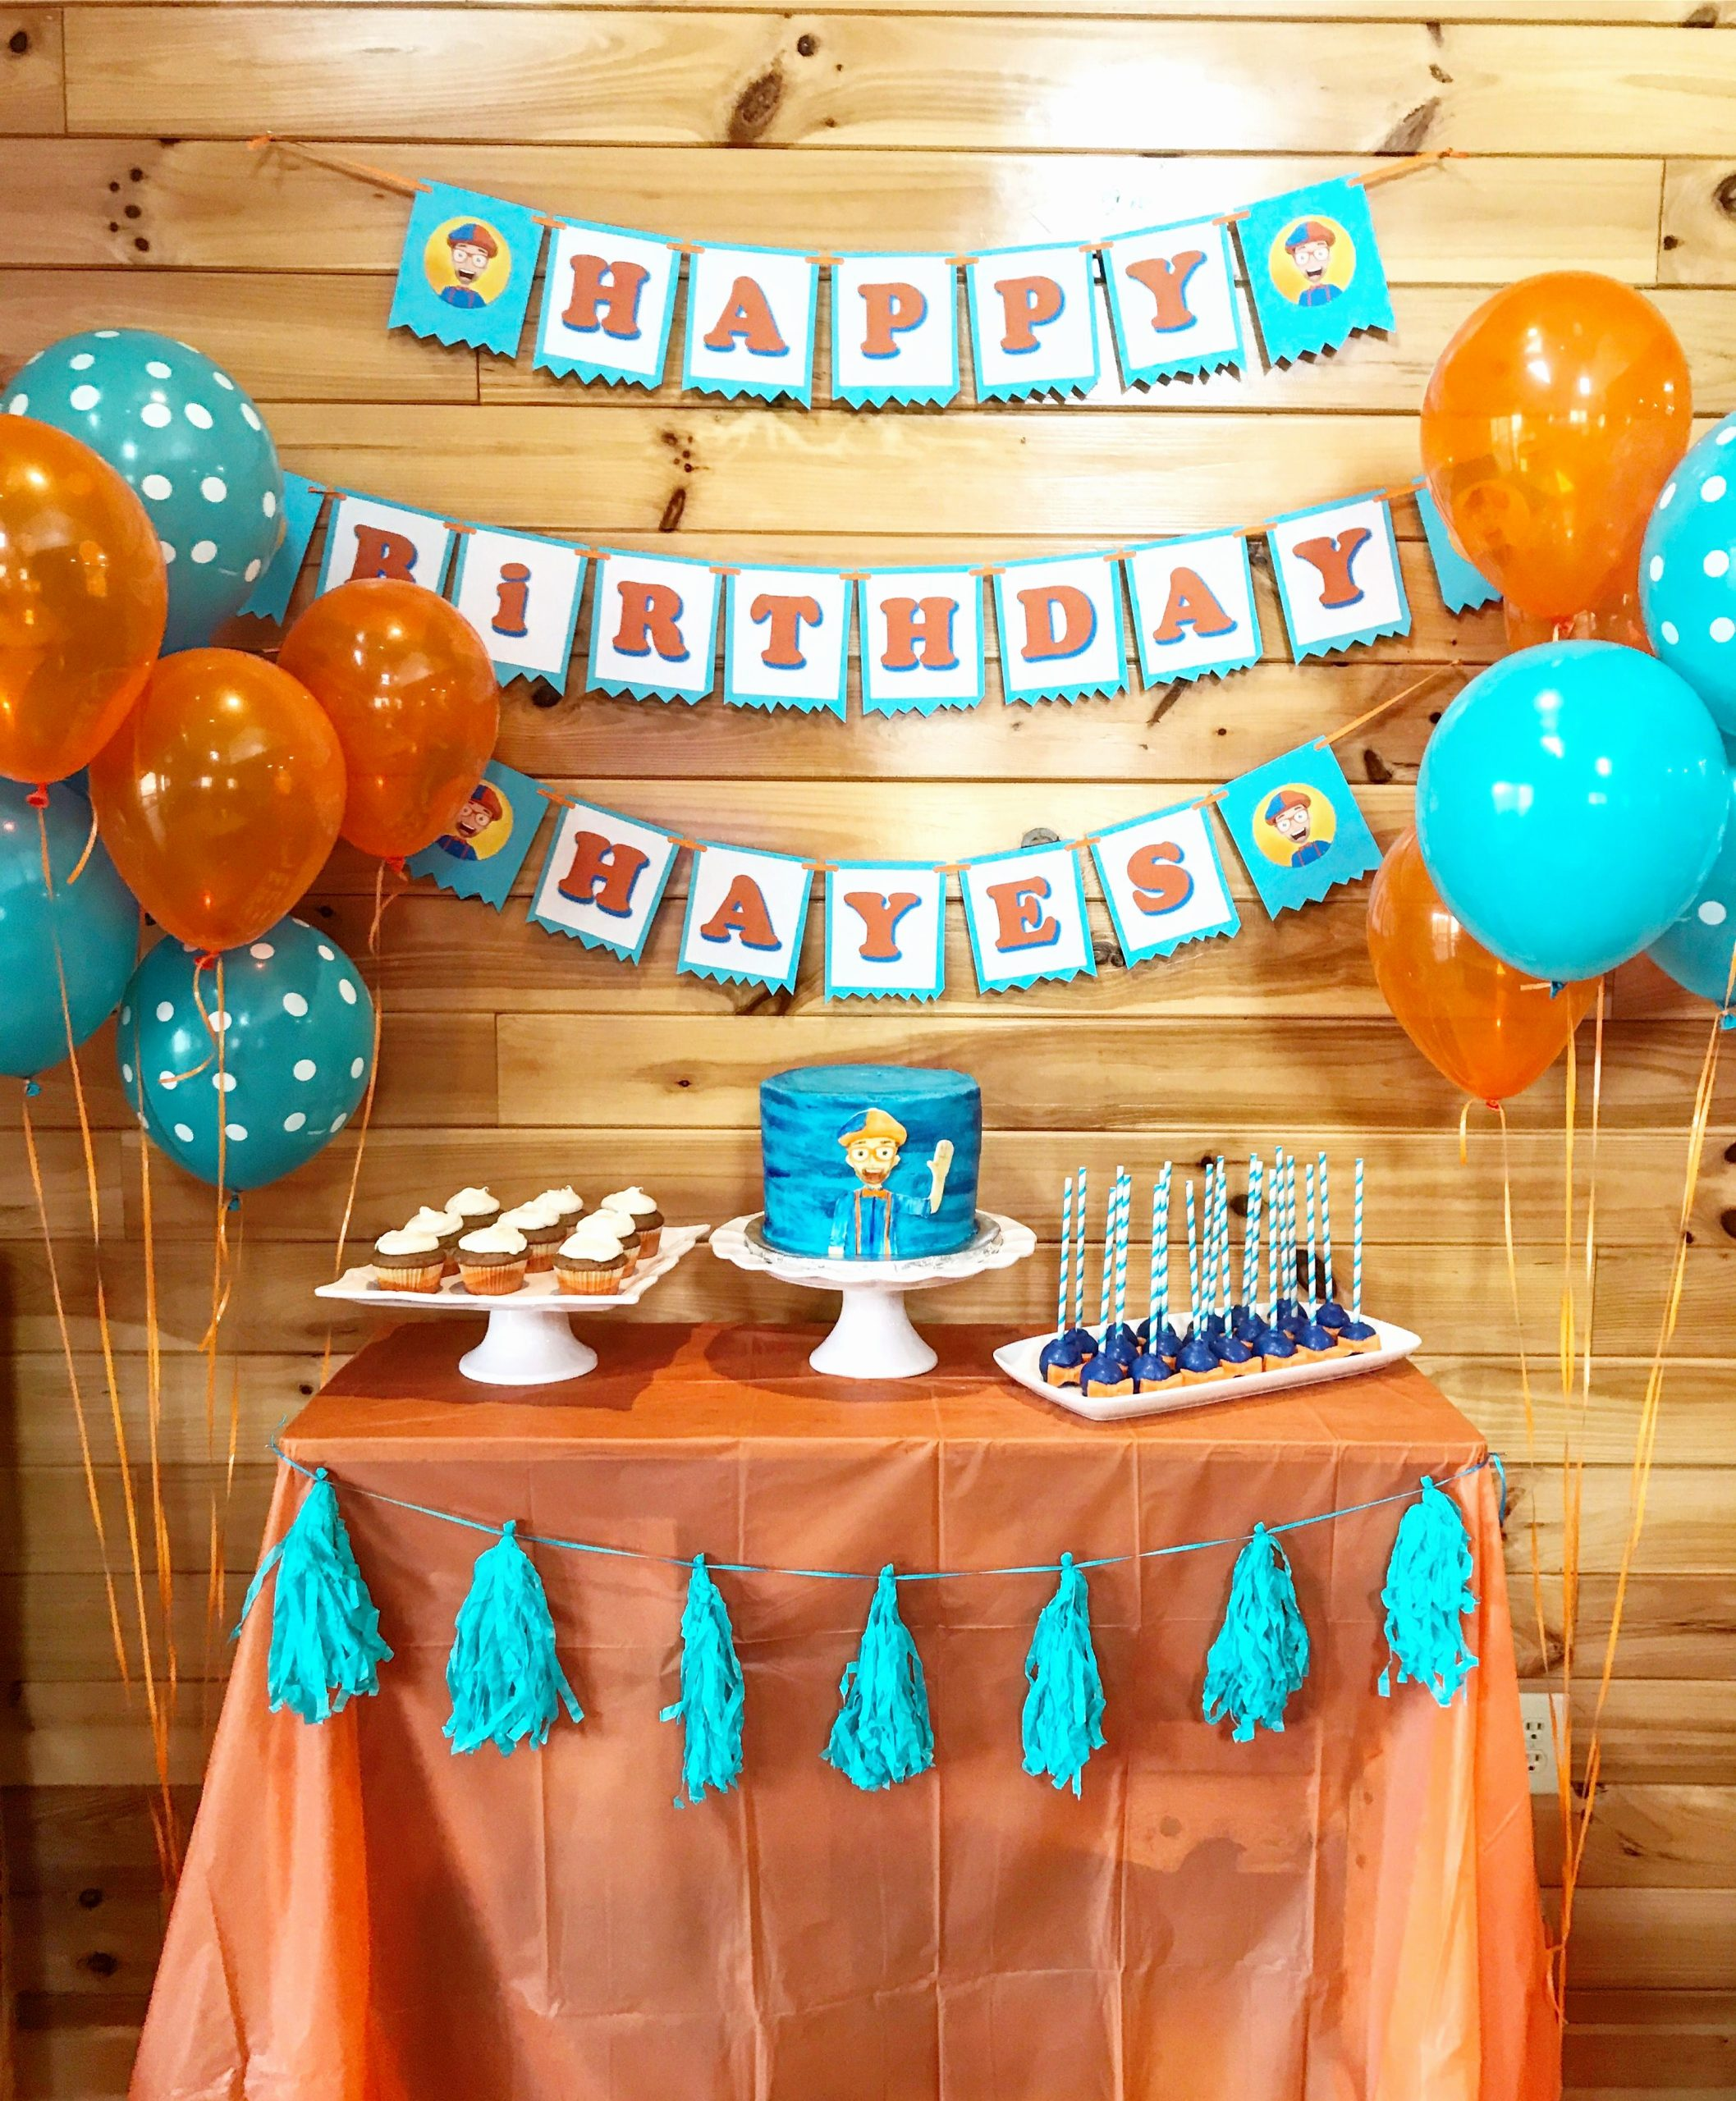 3rd Birthday Decoration Ideas for Boy Lovely Blippi Birthday Party toddler Birthday Party 3rd Birthday